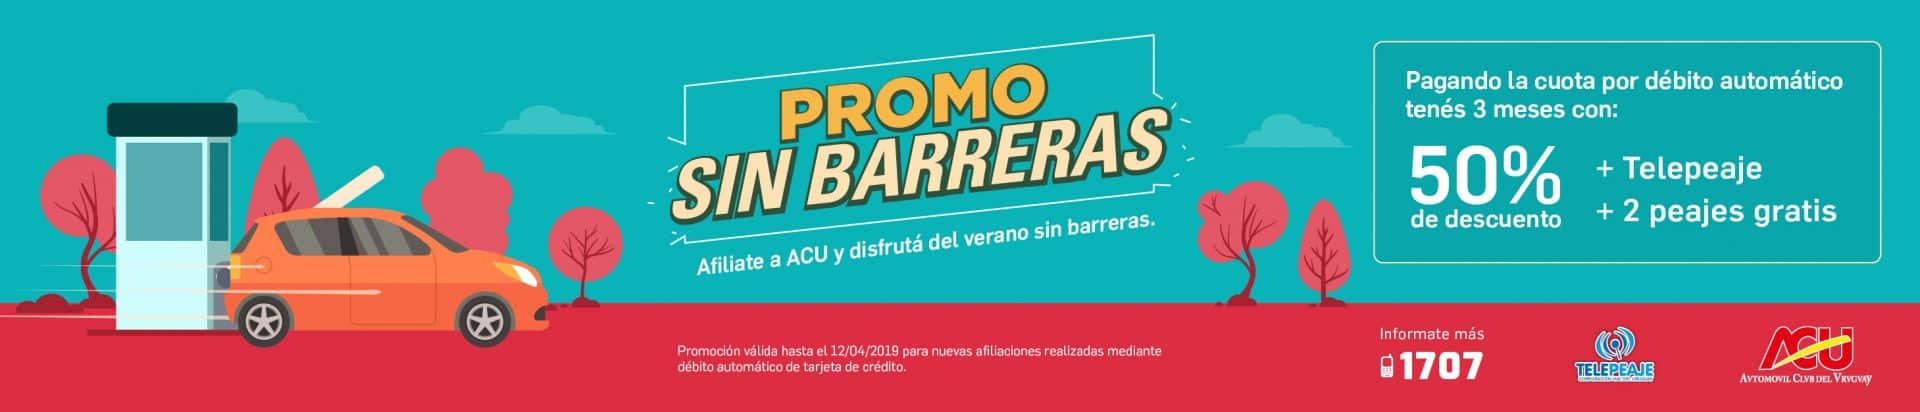 ACU_Promo-Sin-Barreras_v04_slider